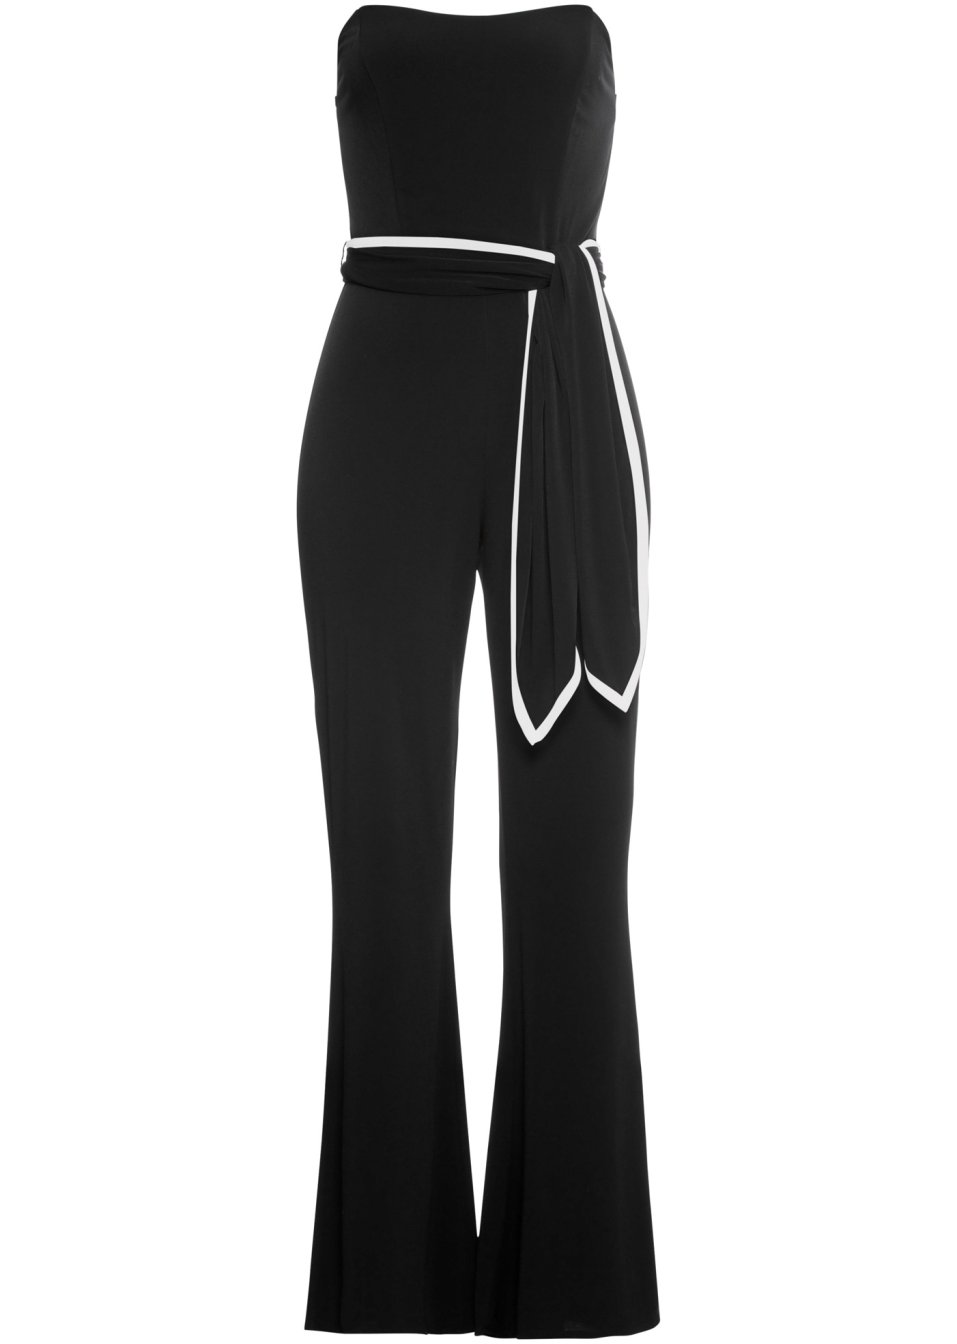 Jumpsuit schwarz/weiß - Damen - bonprix.de cM6xo p8WmR